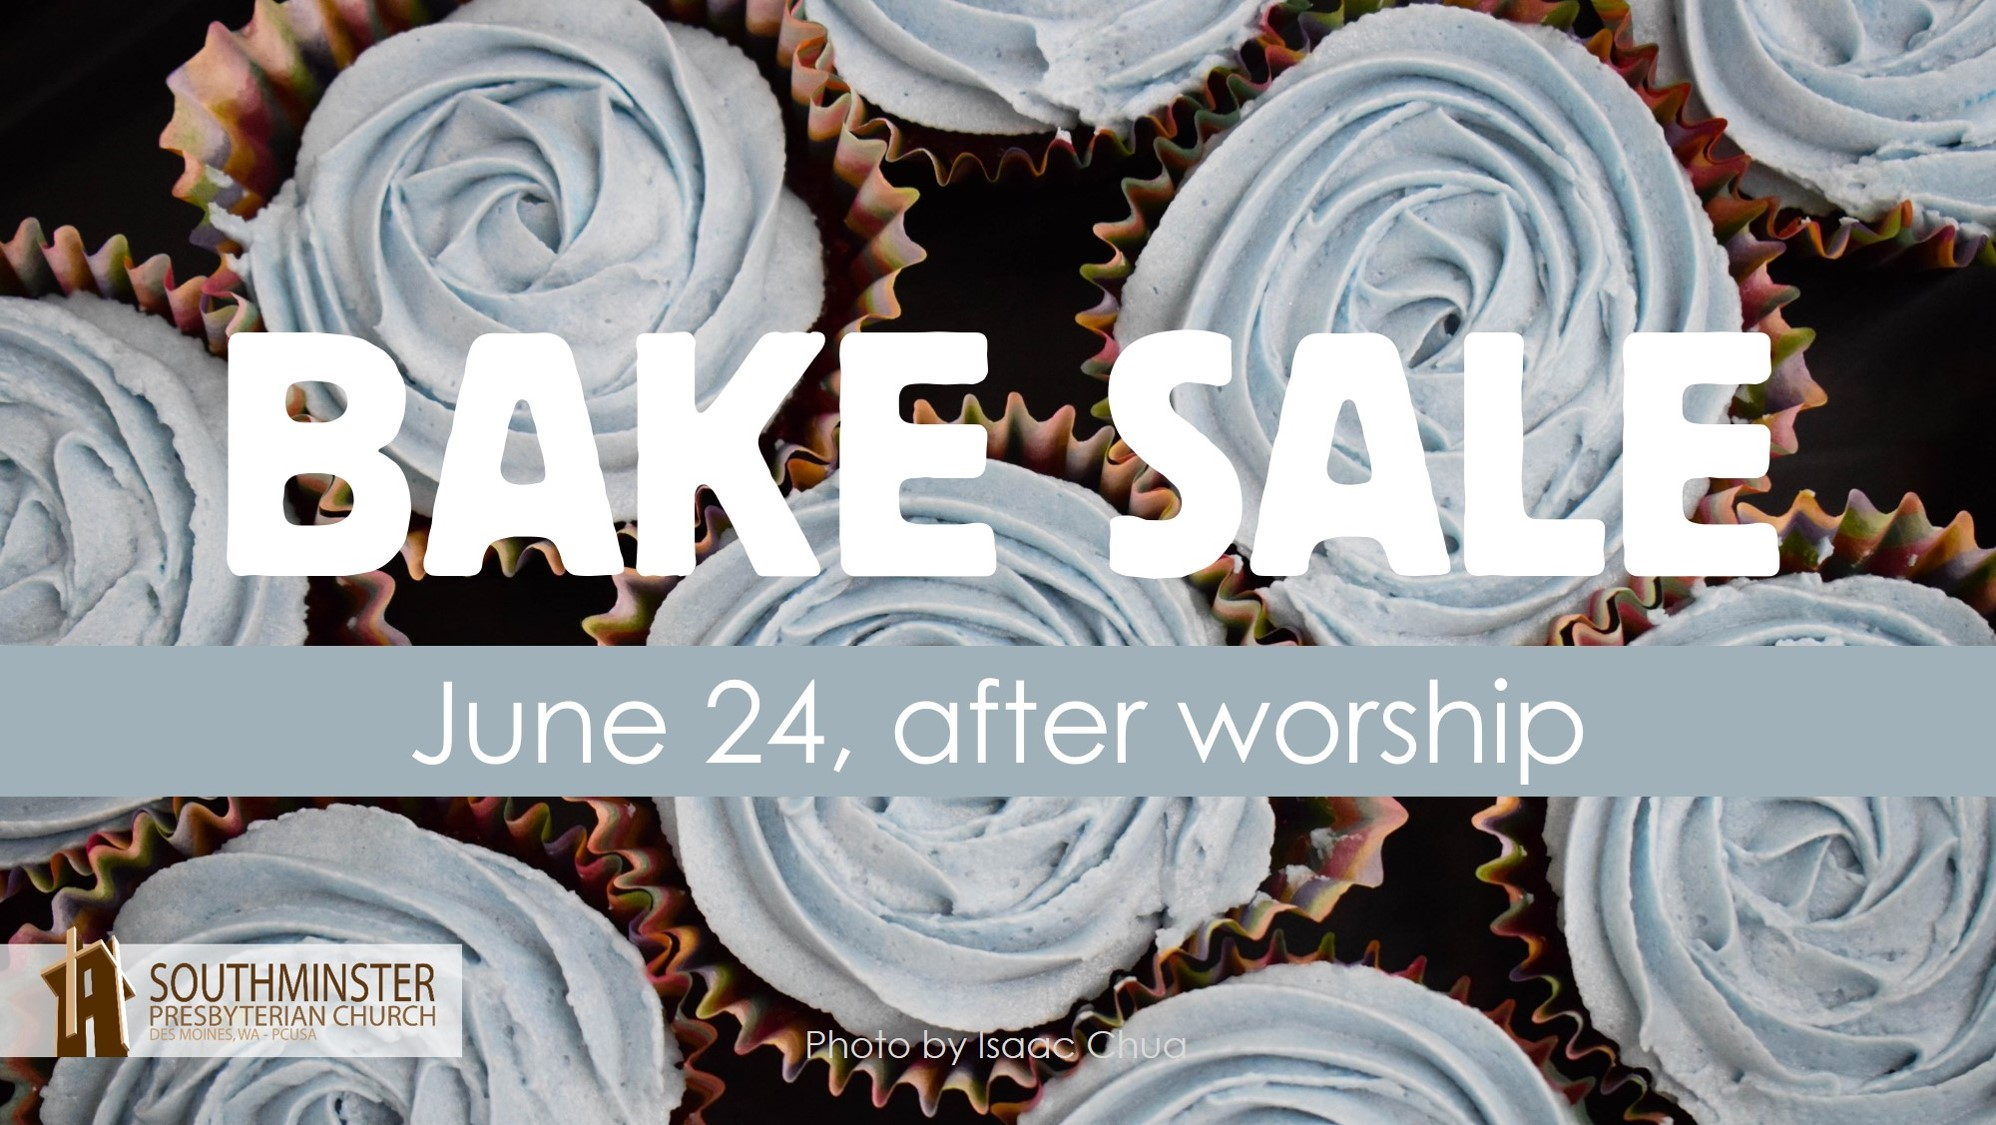 2018-06-24-Bake-Sale.jpg